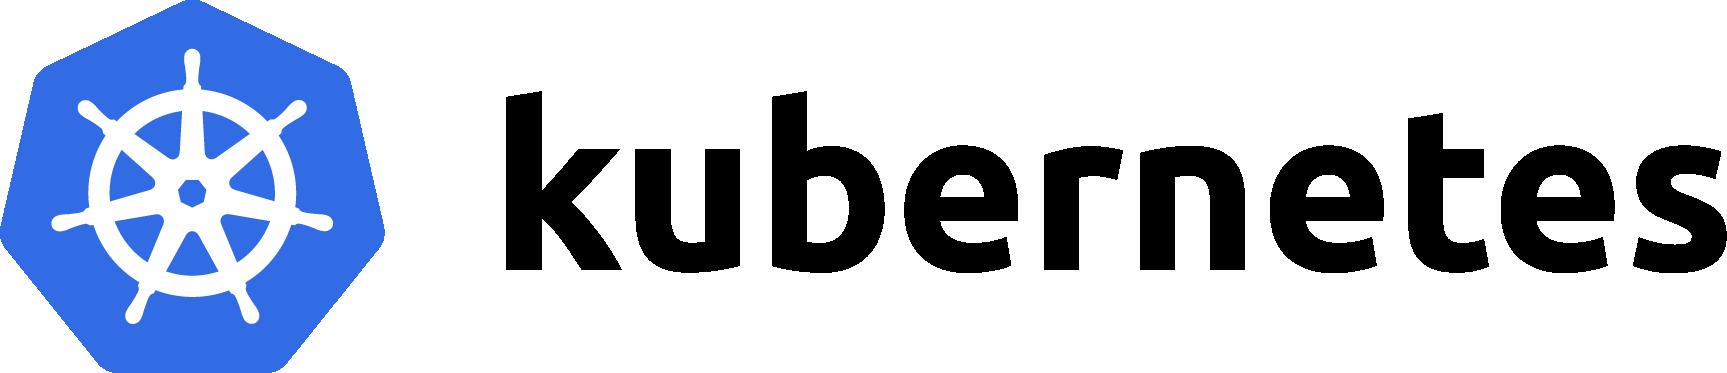 k8-logo